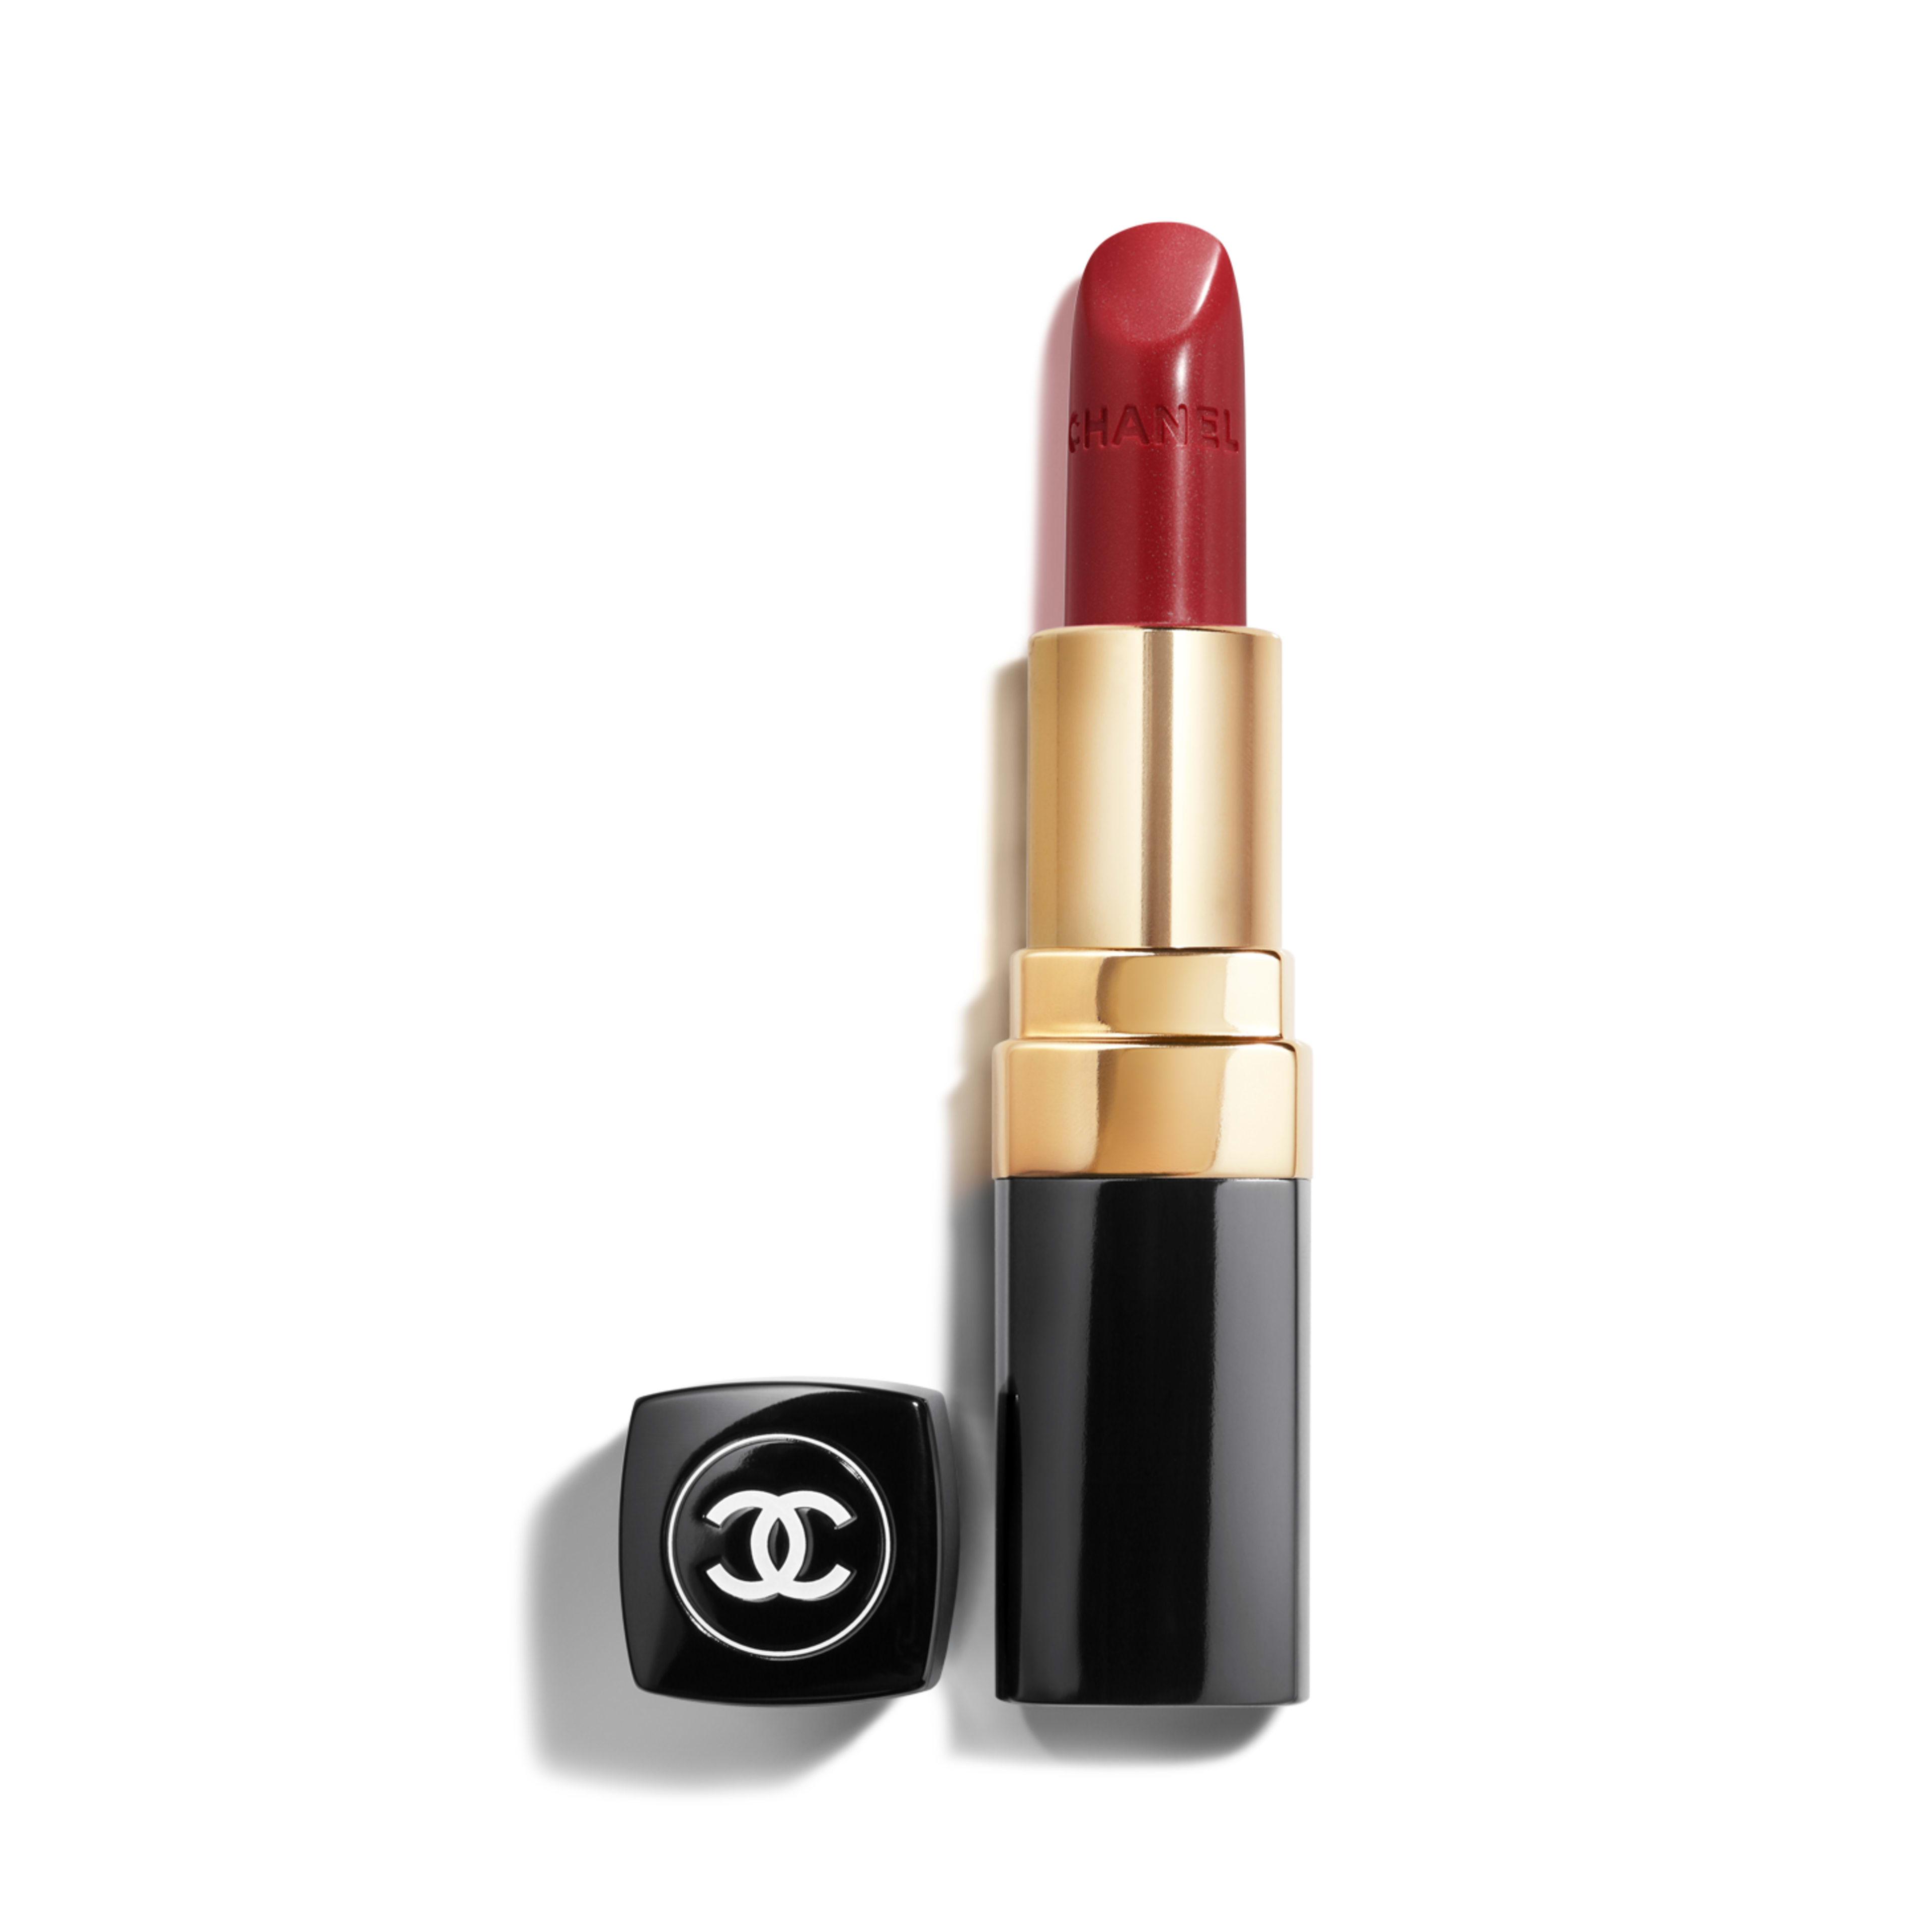 ROUGE COCO - makeup - 3.5g - Default view